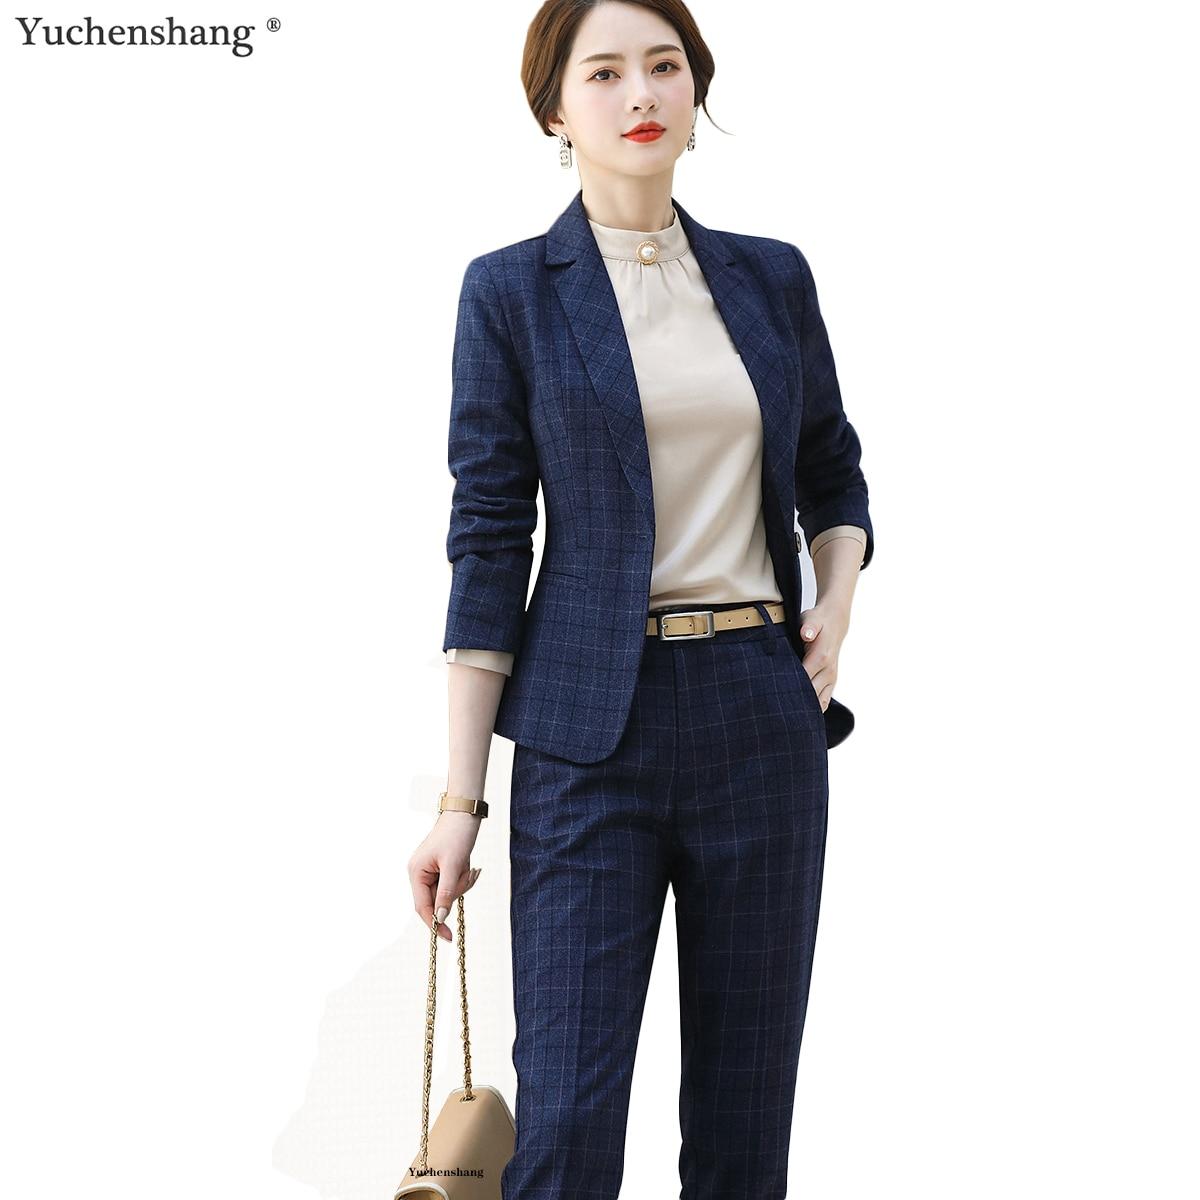 2 Pieces Set High-quality Women Plaid Pant Suit Casual Blazer Jacket Coats With Pant Trousers